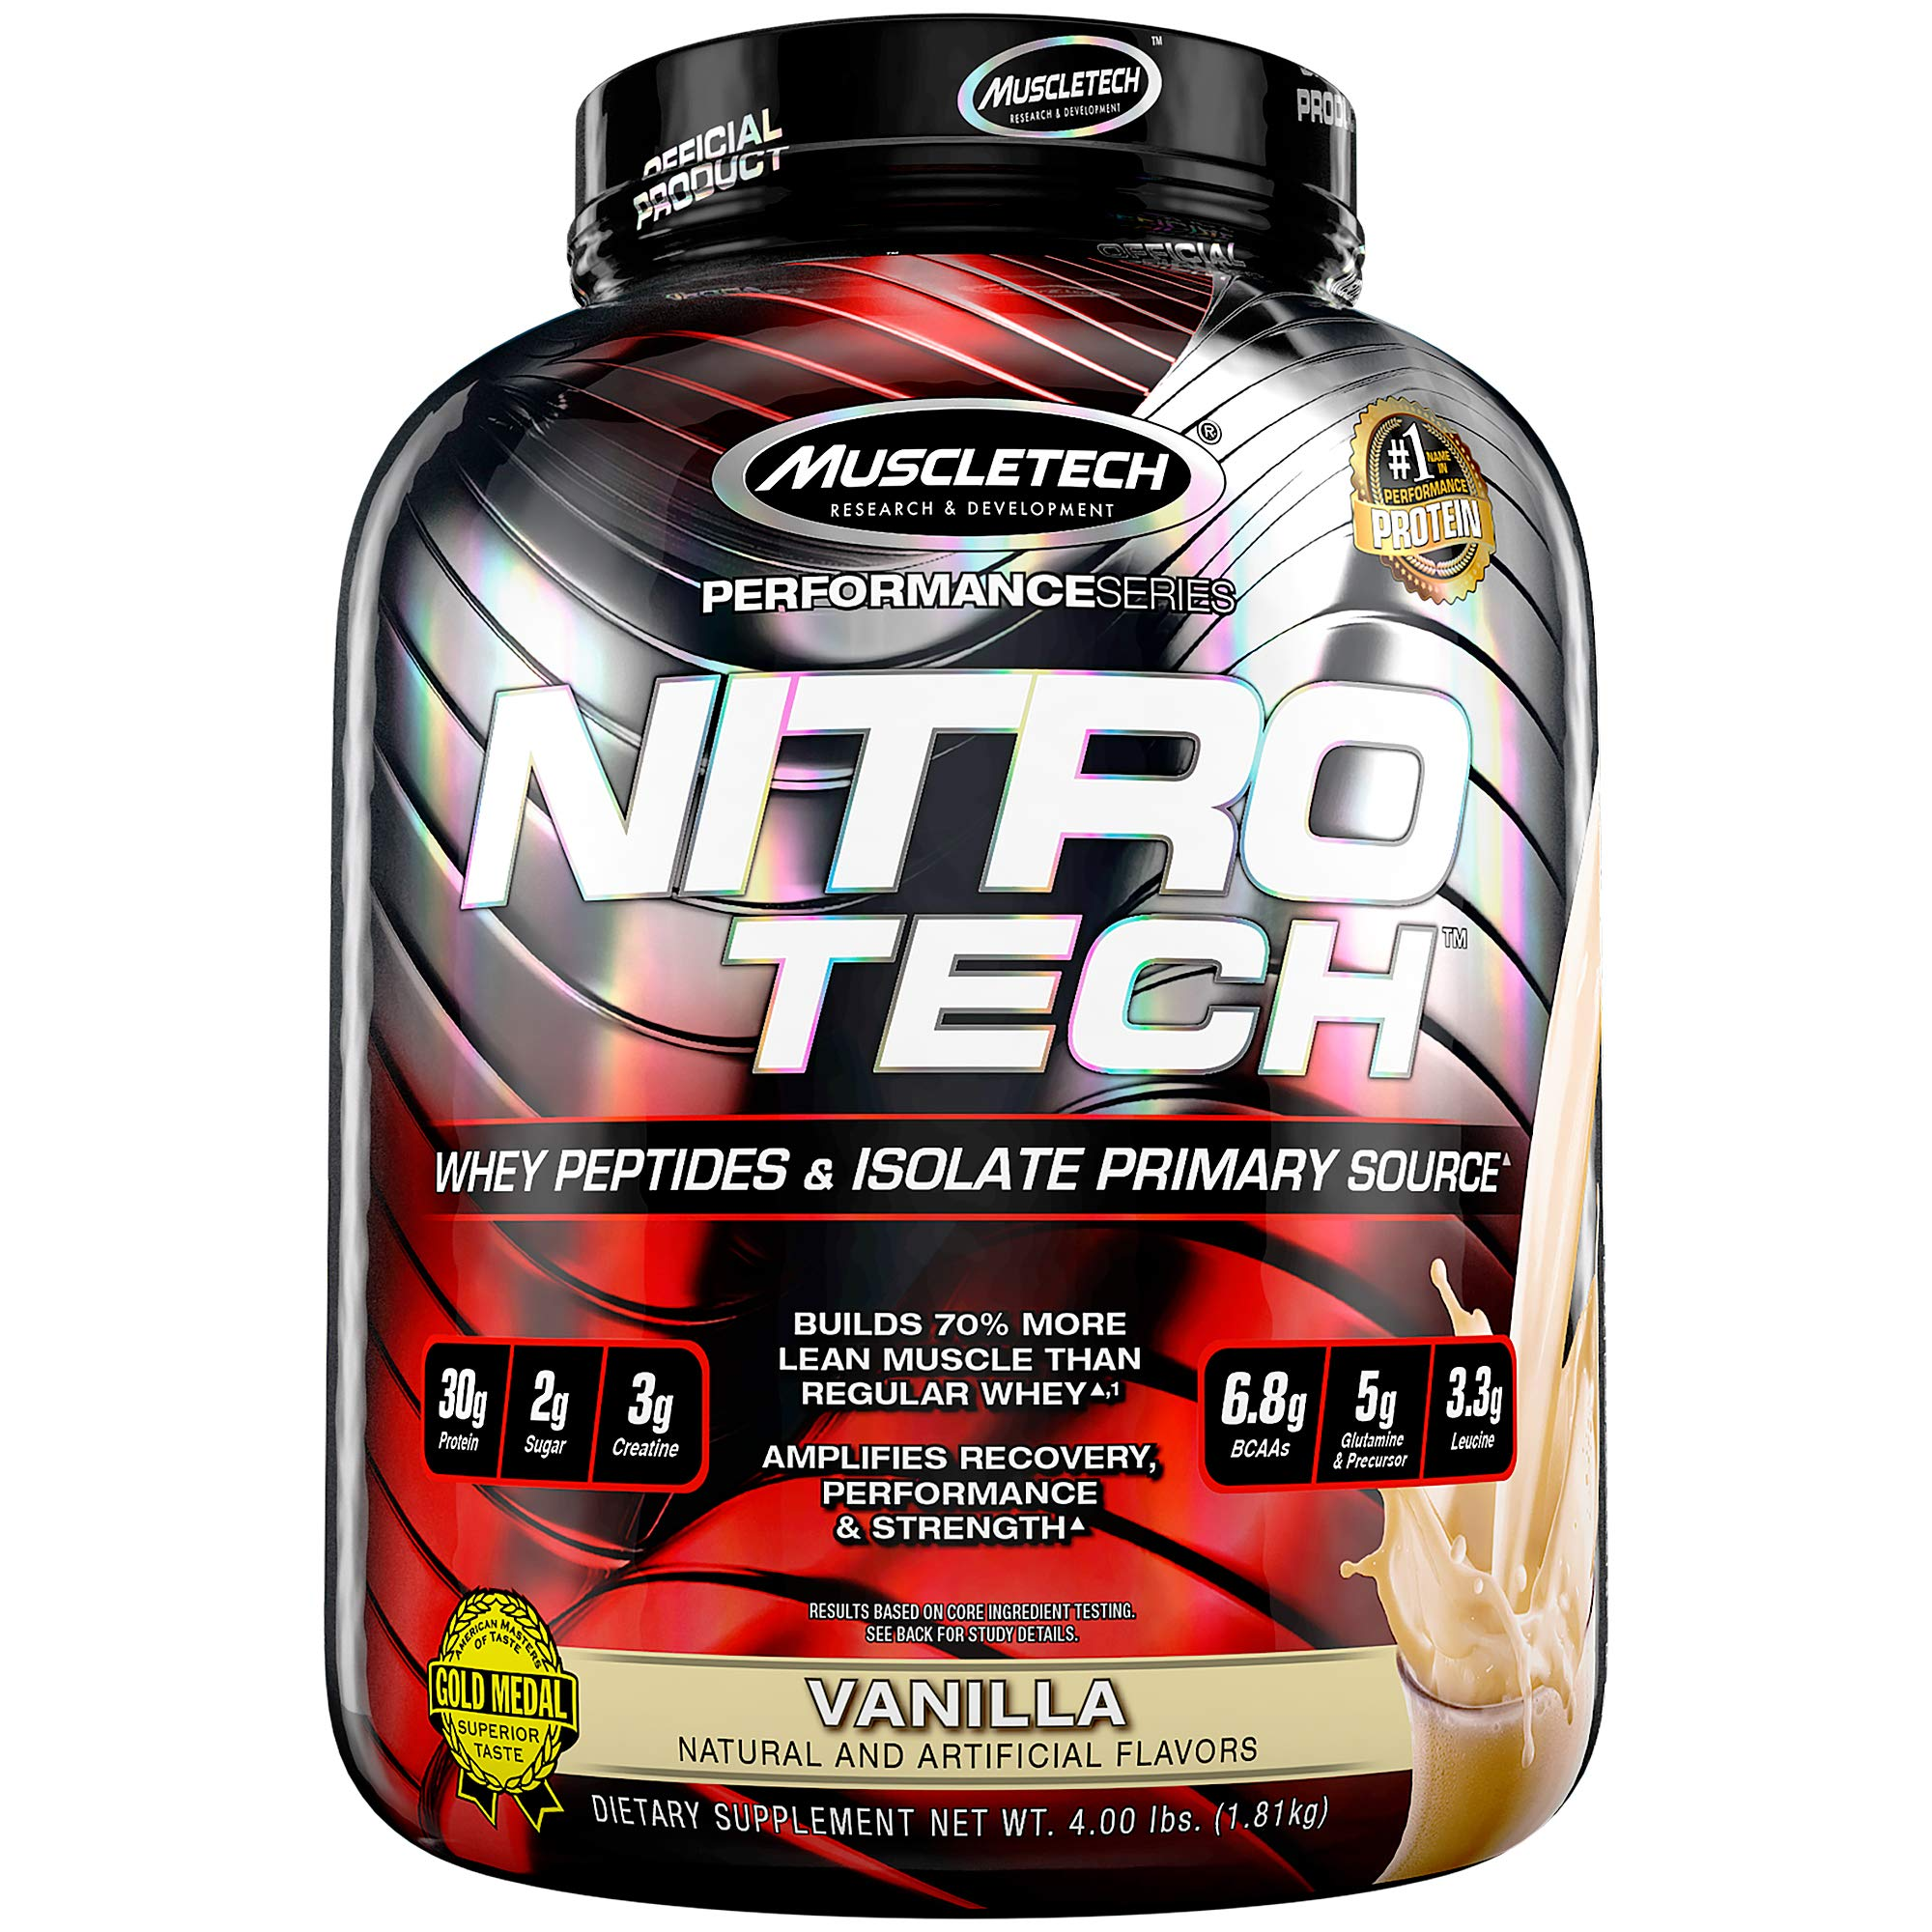 Whey Protein Powder   MuscleTech Nitro-Tech Whey Protein Isolate & Peptides   Lean Protein Powder for Muscle Gain   Muscle Builder for Men & Women   Sports Nutrition   Vanilla, 4 lb (40 Servings)